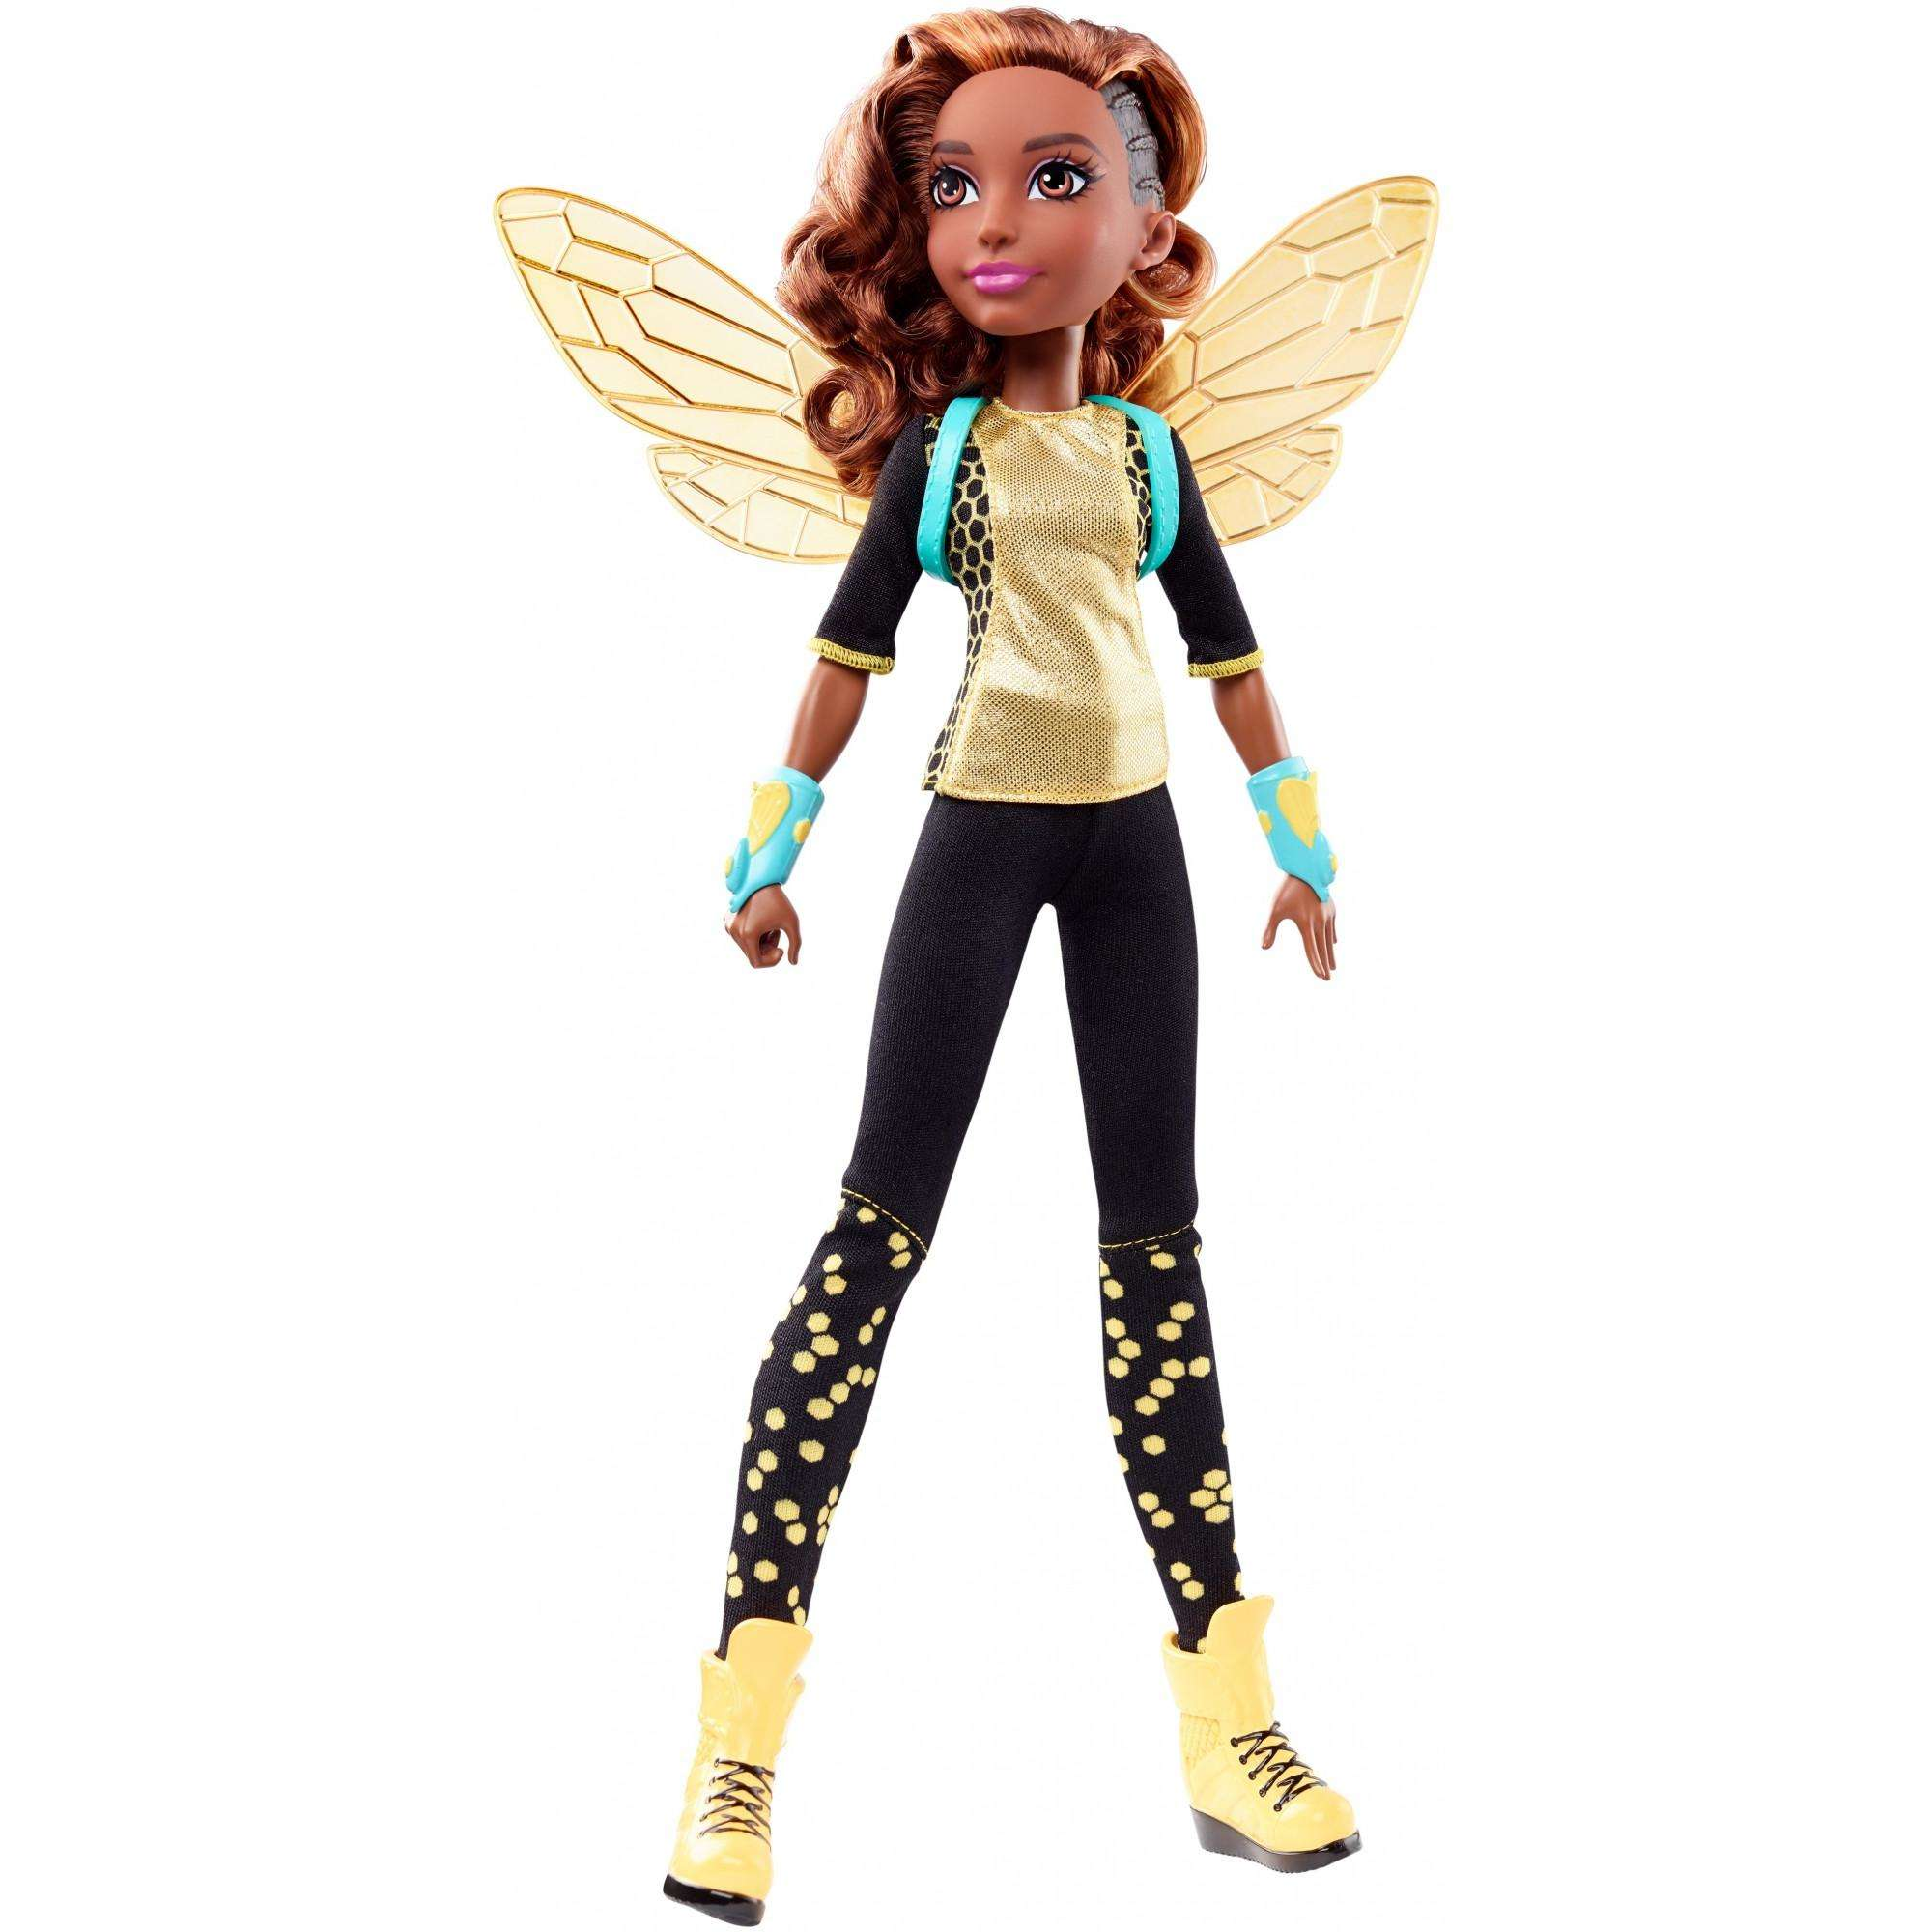 "DC Super Hero Girls Bumblebee 12"" Action Doll by MATTEL INC."